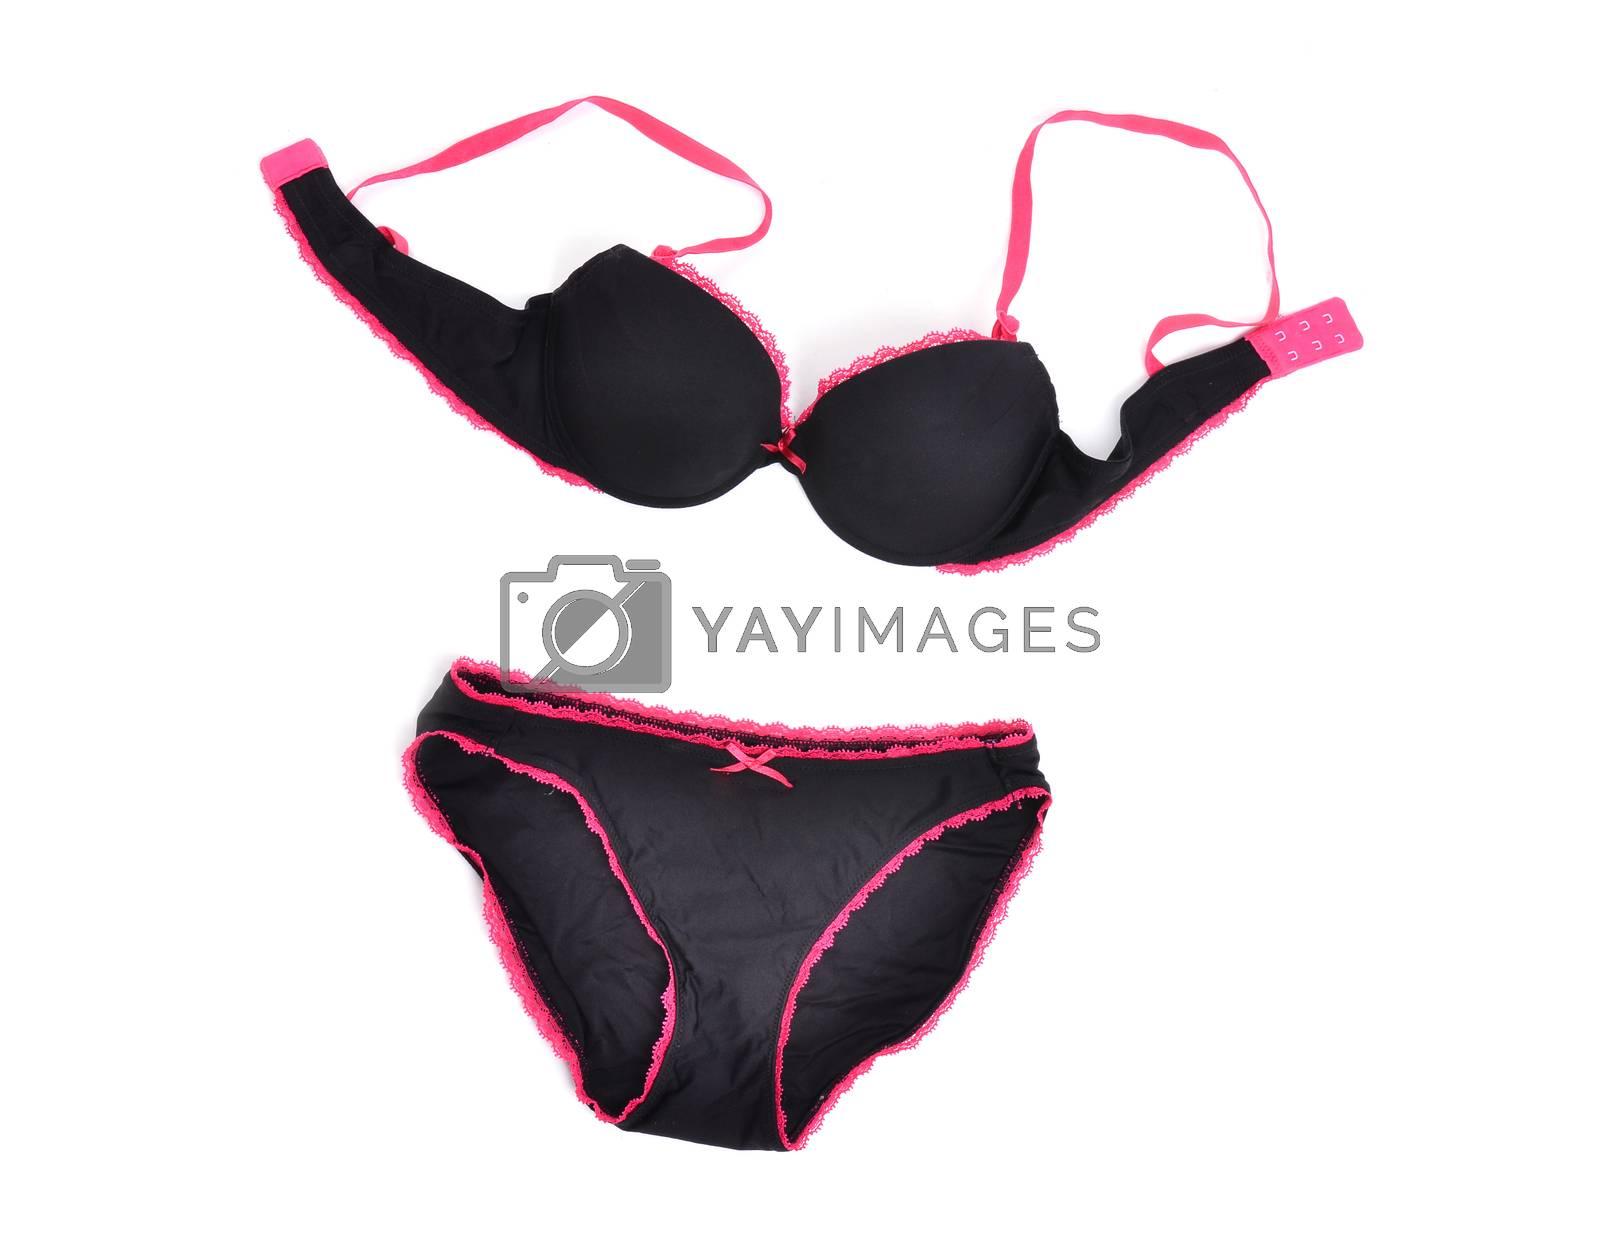 sexy female underwear by anankkml